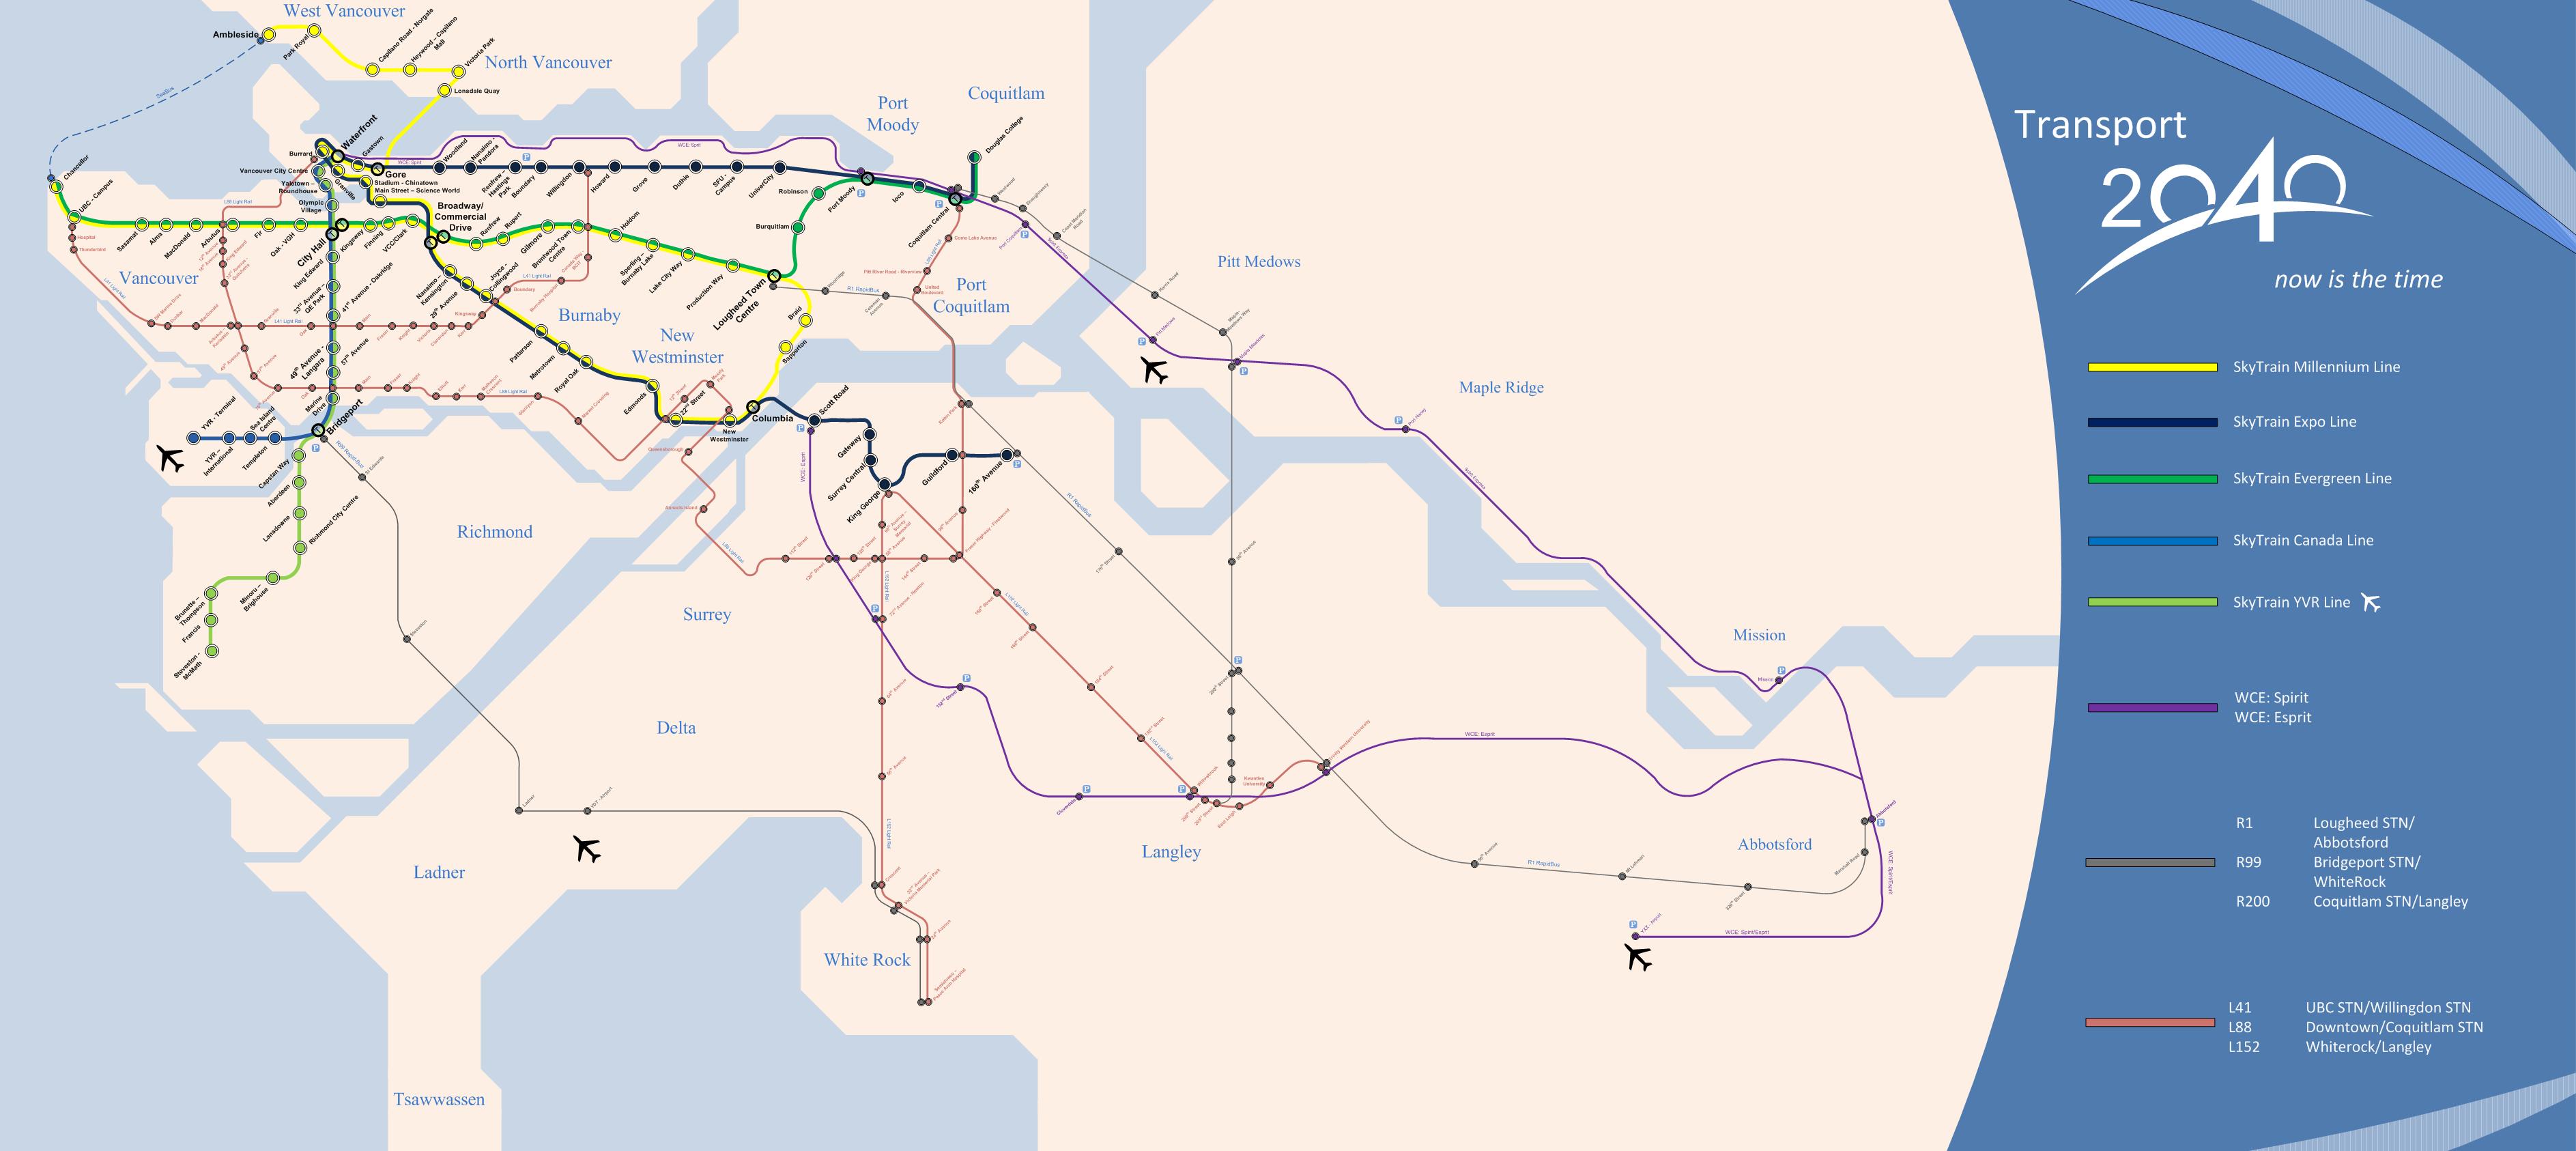 Vancouver Subway Map.Vancouver Transit 2040 Fantasy Map Transit In 2019 Fantasy Map